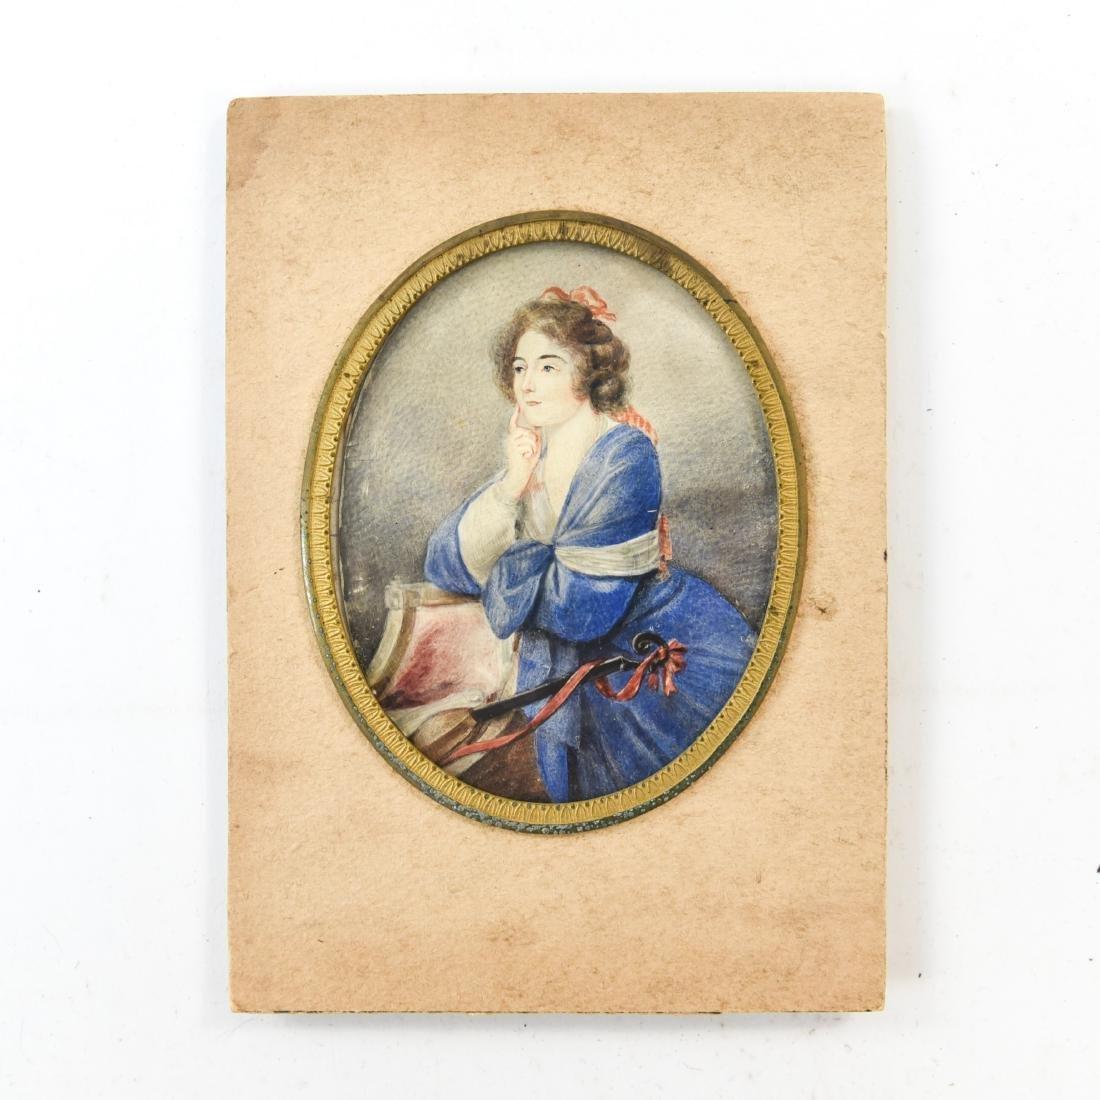 MINIATURE PORTRAIT OF WOMAN WITH MANDOLIN